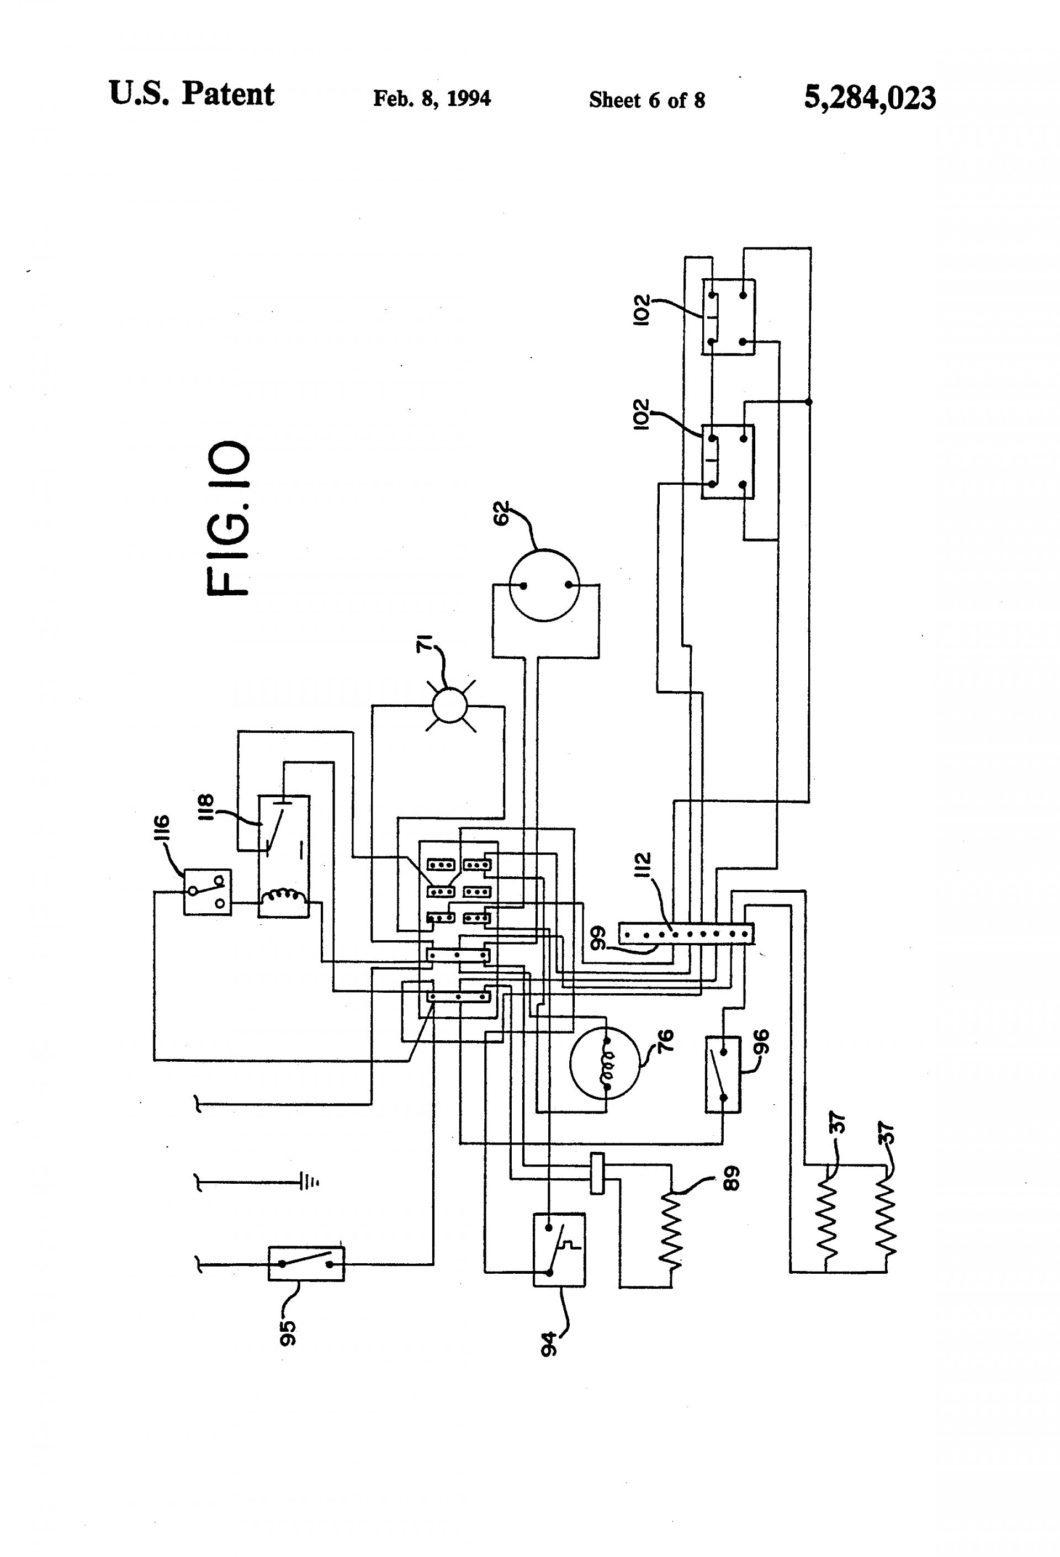 Mastercool Evaporative Cooler Wiring Diagram | Wiring Diagram - Swamp Cooler Wiring Diagram